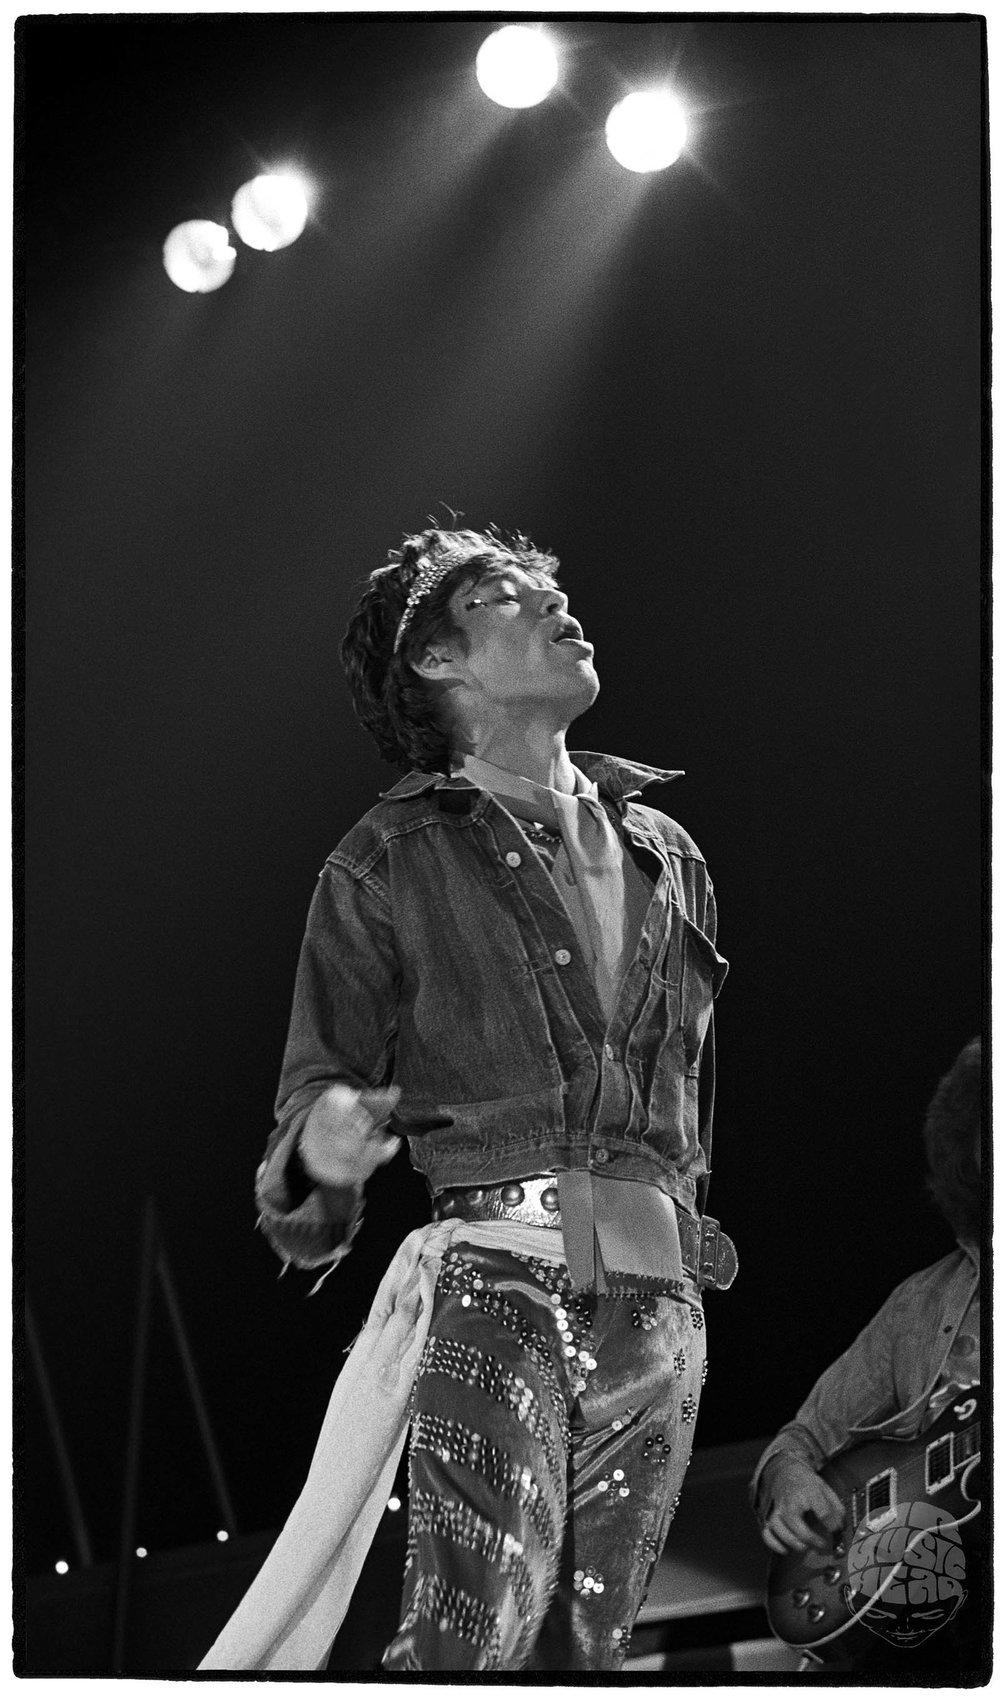 al satterwhite_rolling stones_Mick Jagger-2.jpg